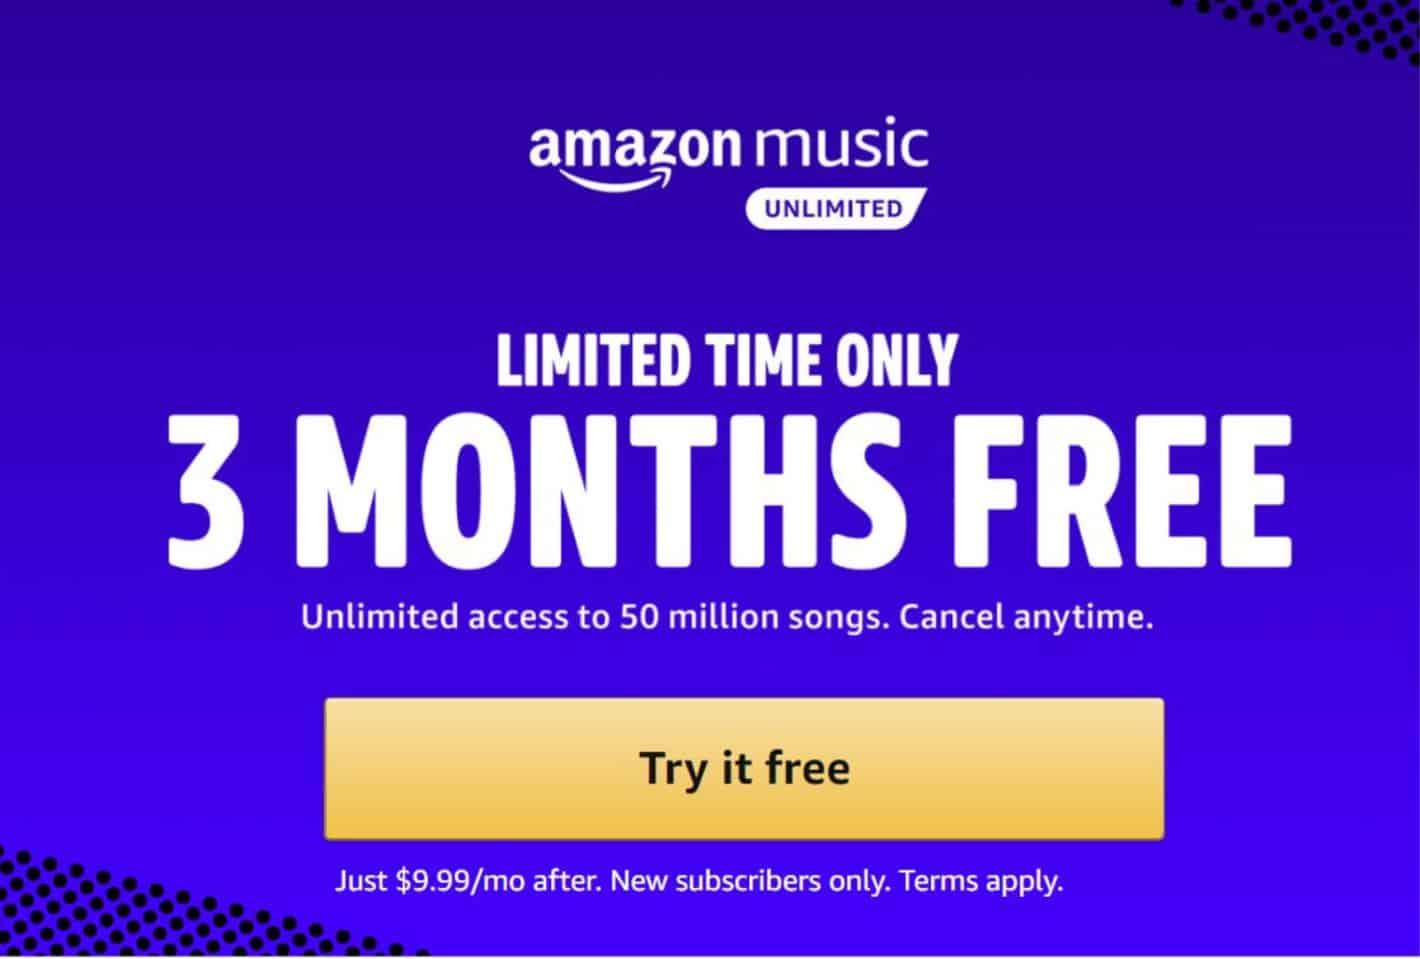 Amazon Free Unlimited